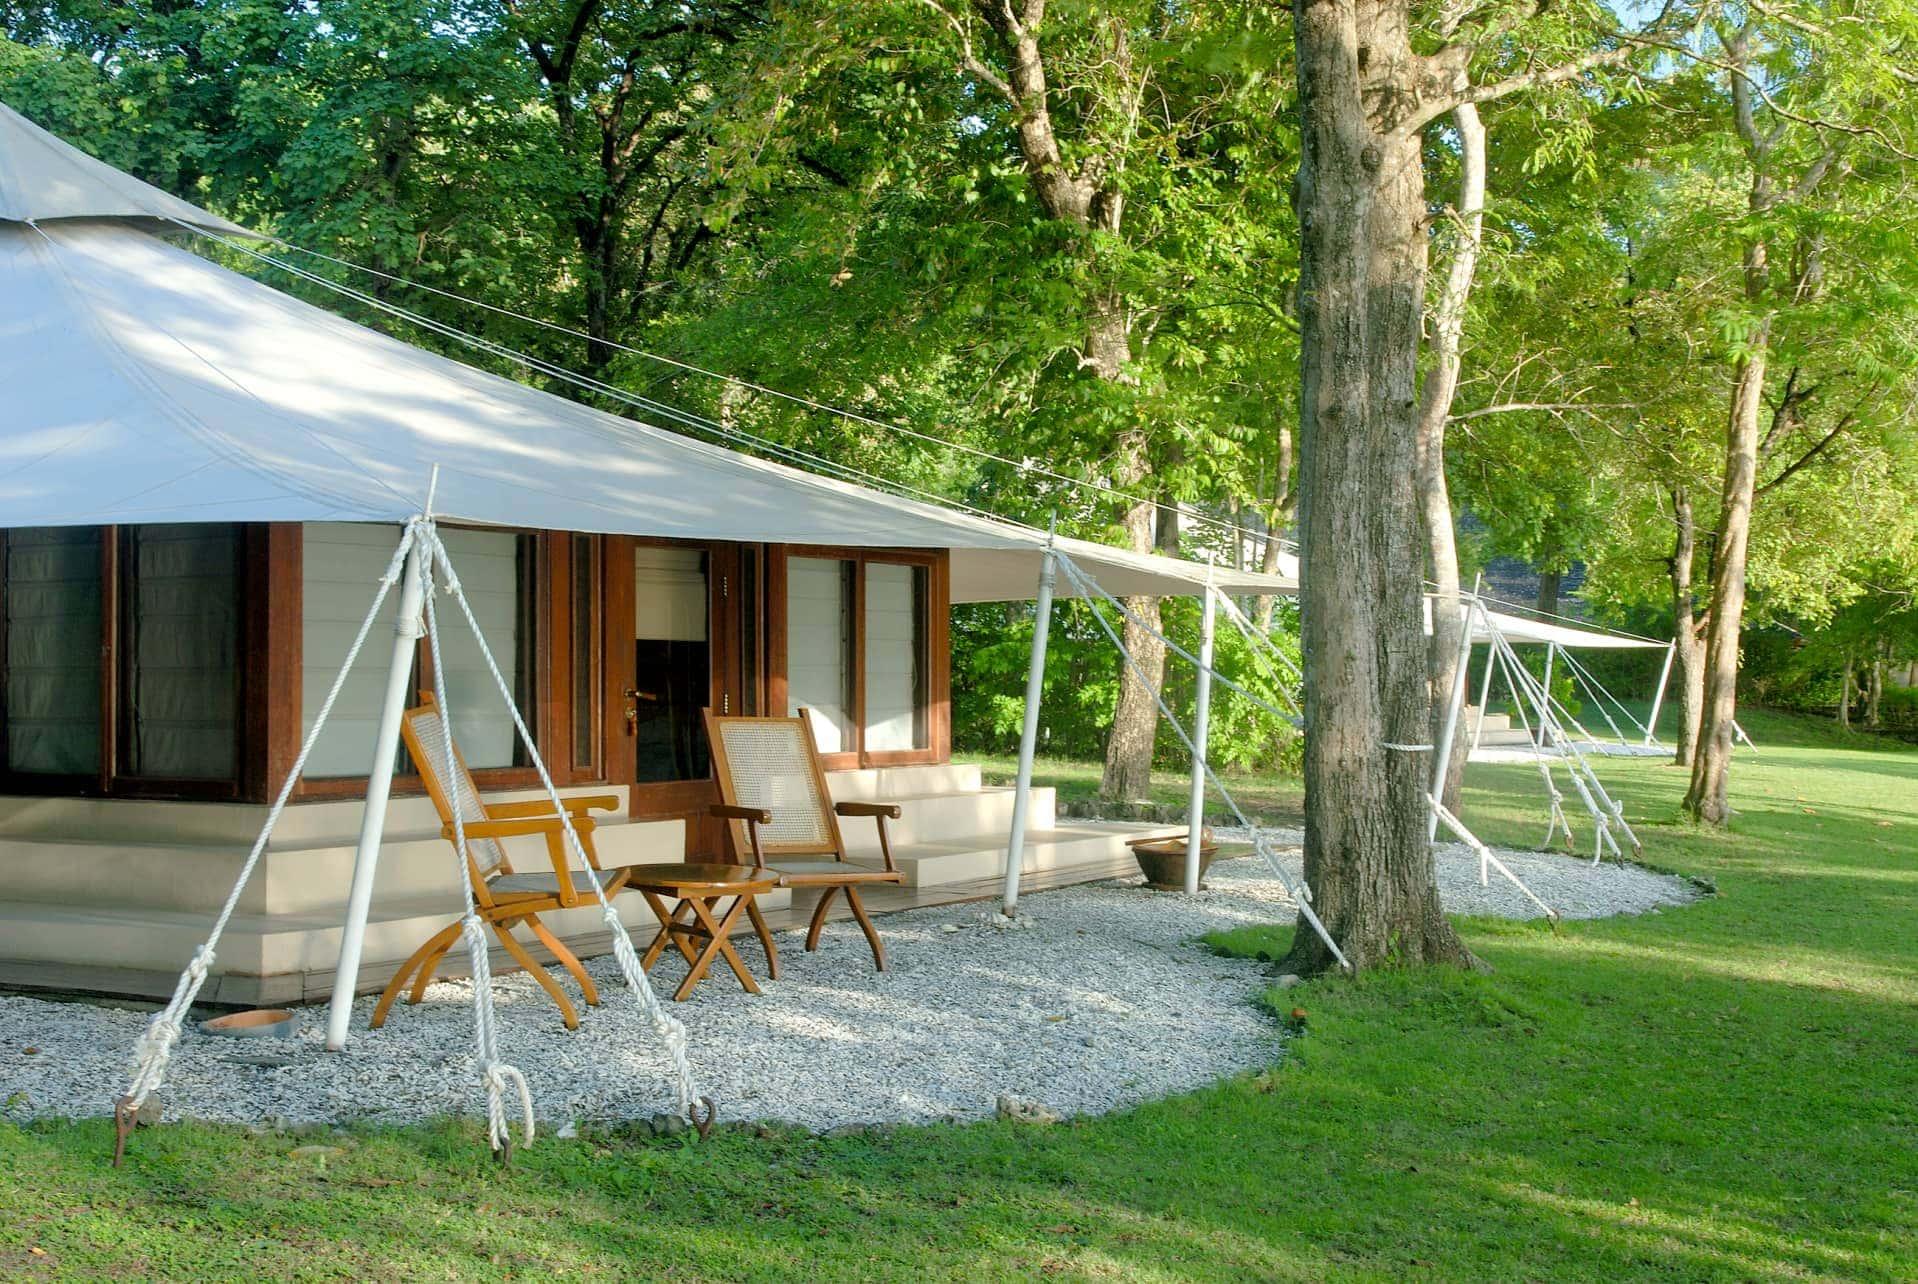 camping de luxe reisen exclusiv. Black Bedroom Furniture Sets. Home Design Ideas